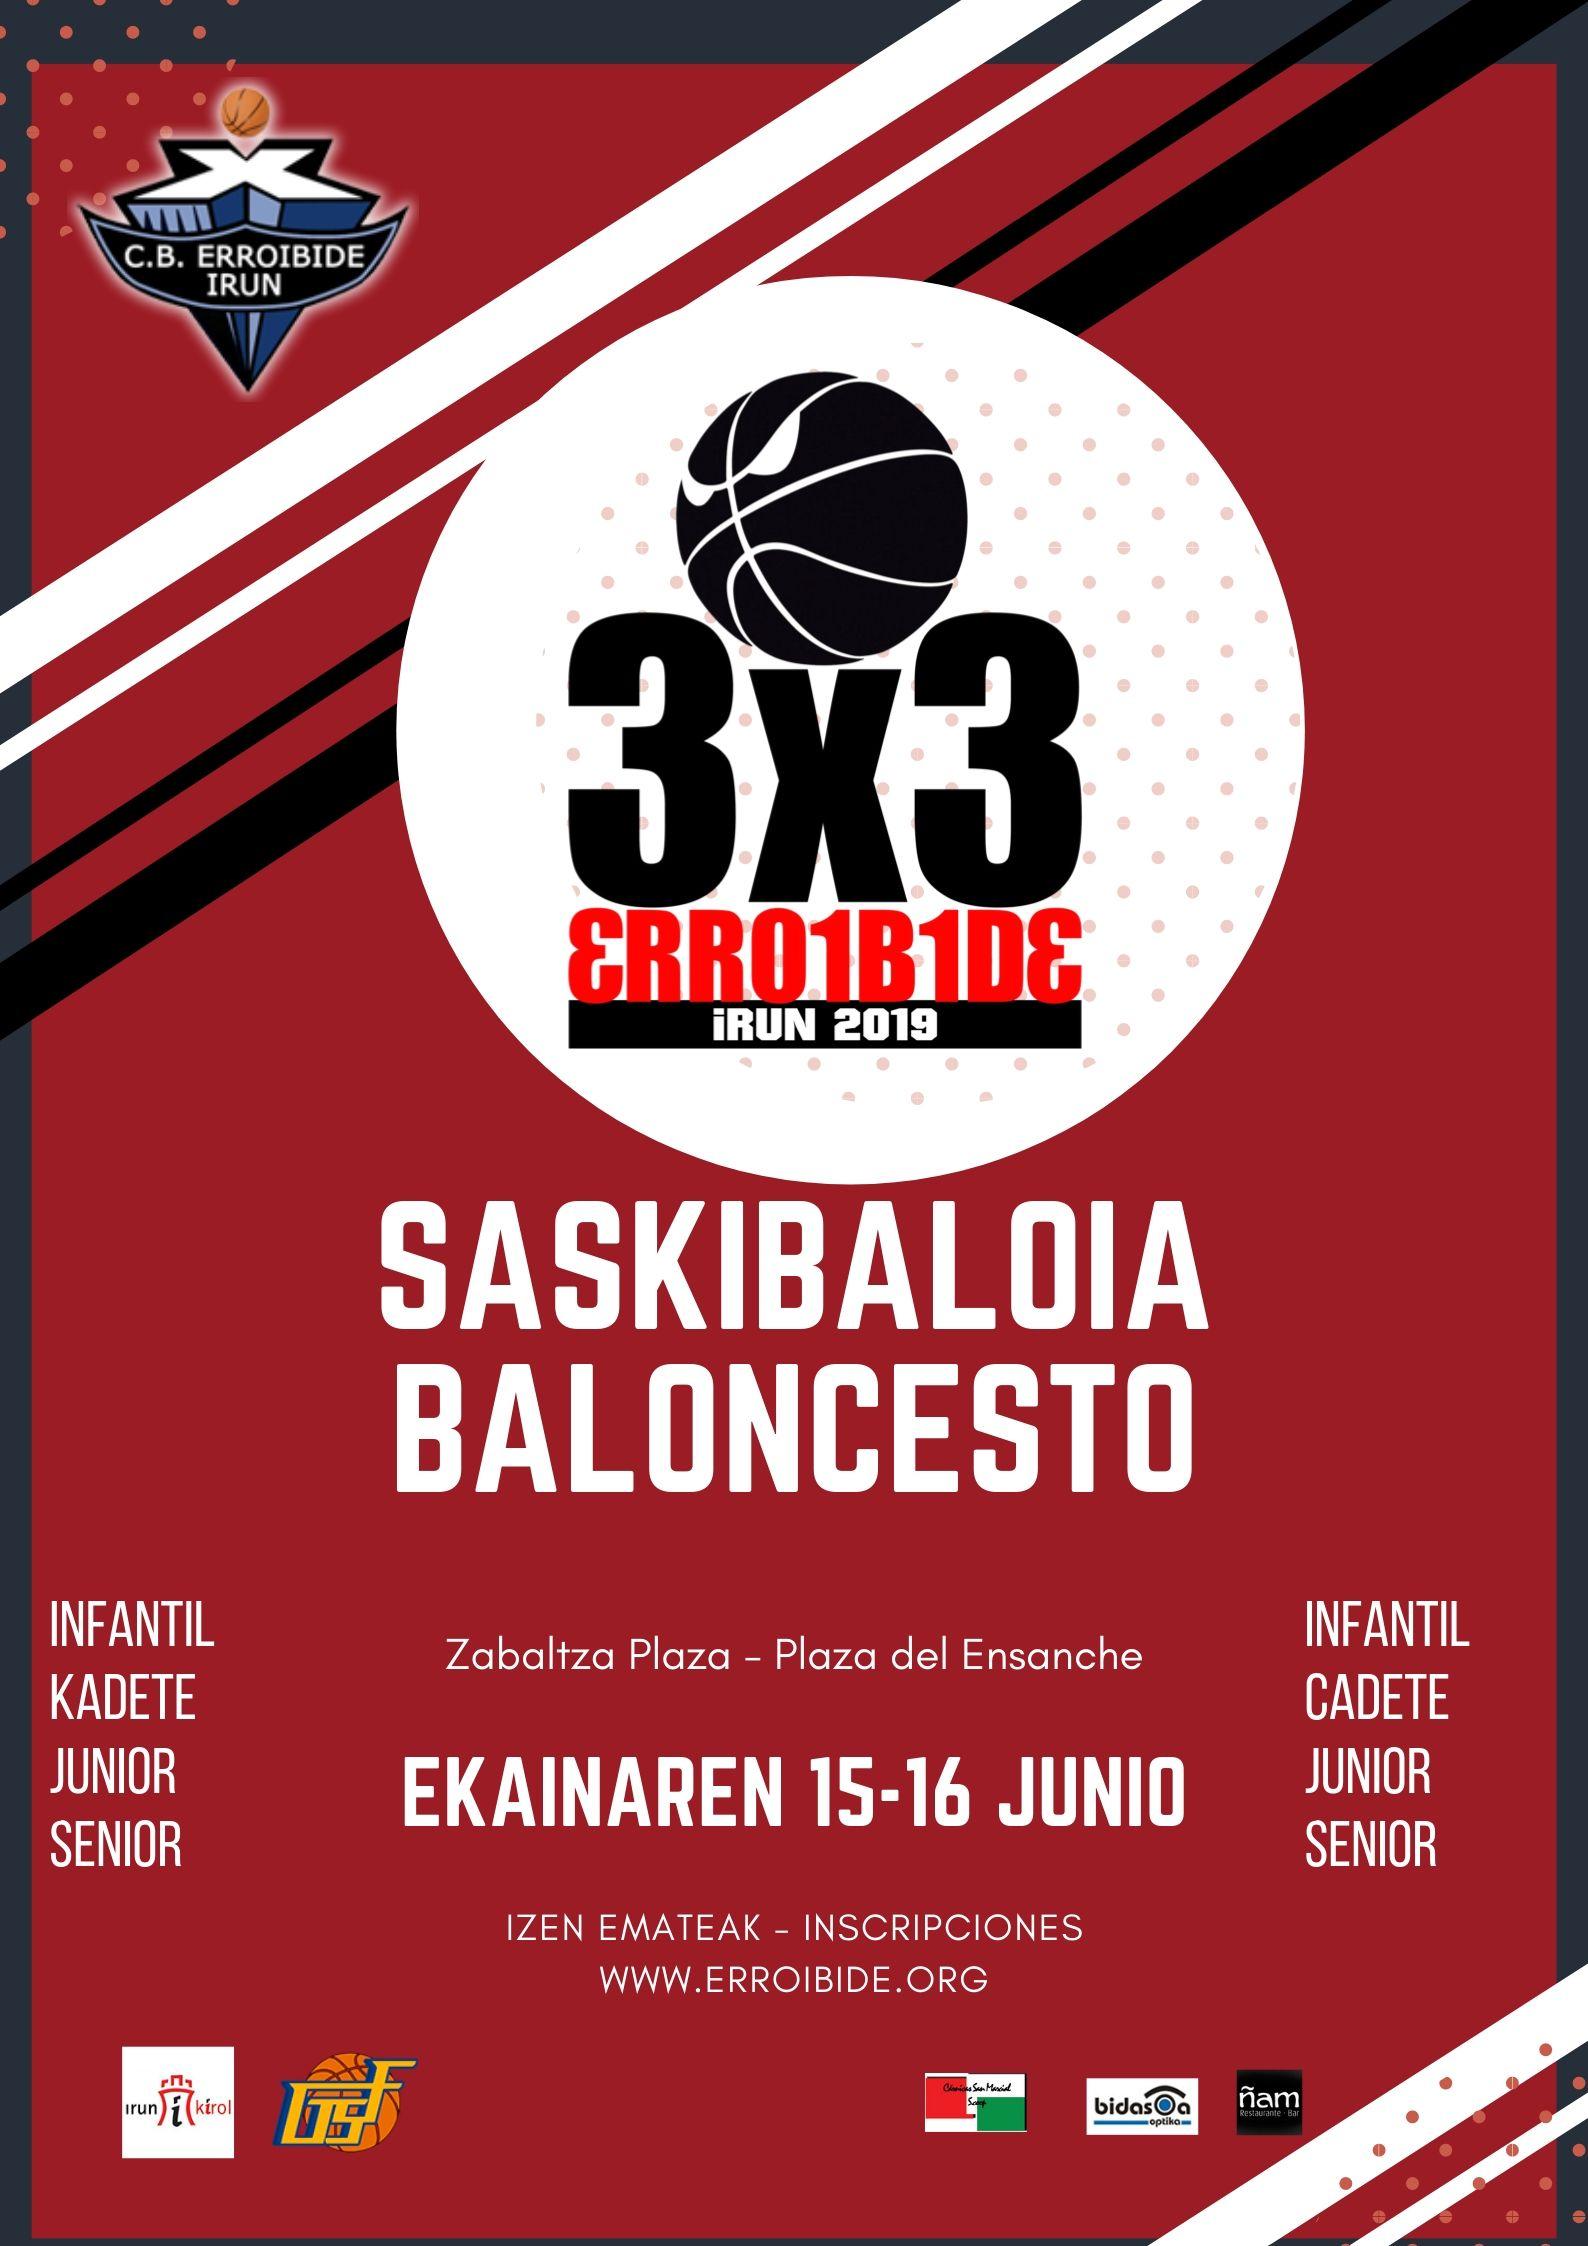 Torneo 3×3 2019                    C.B. ERROIBIDE